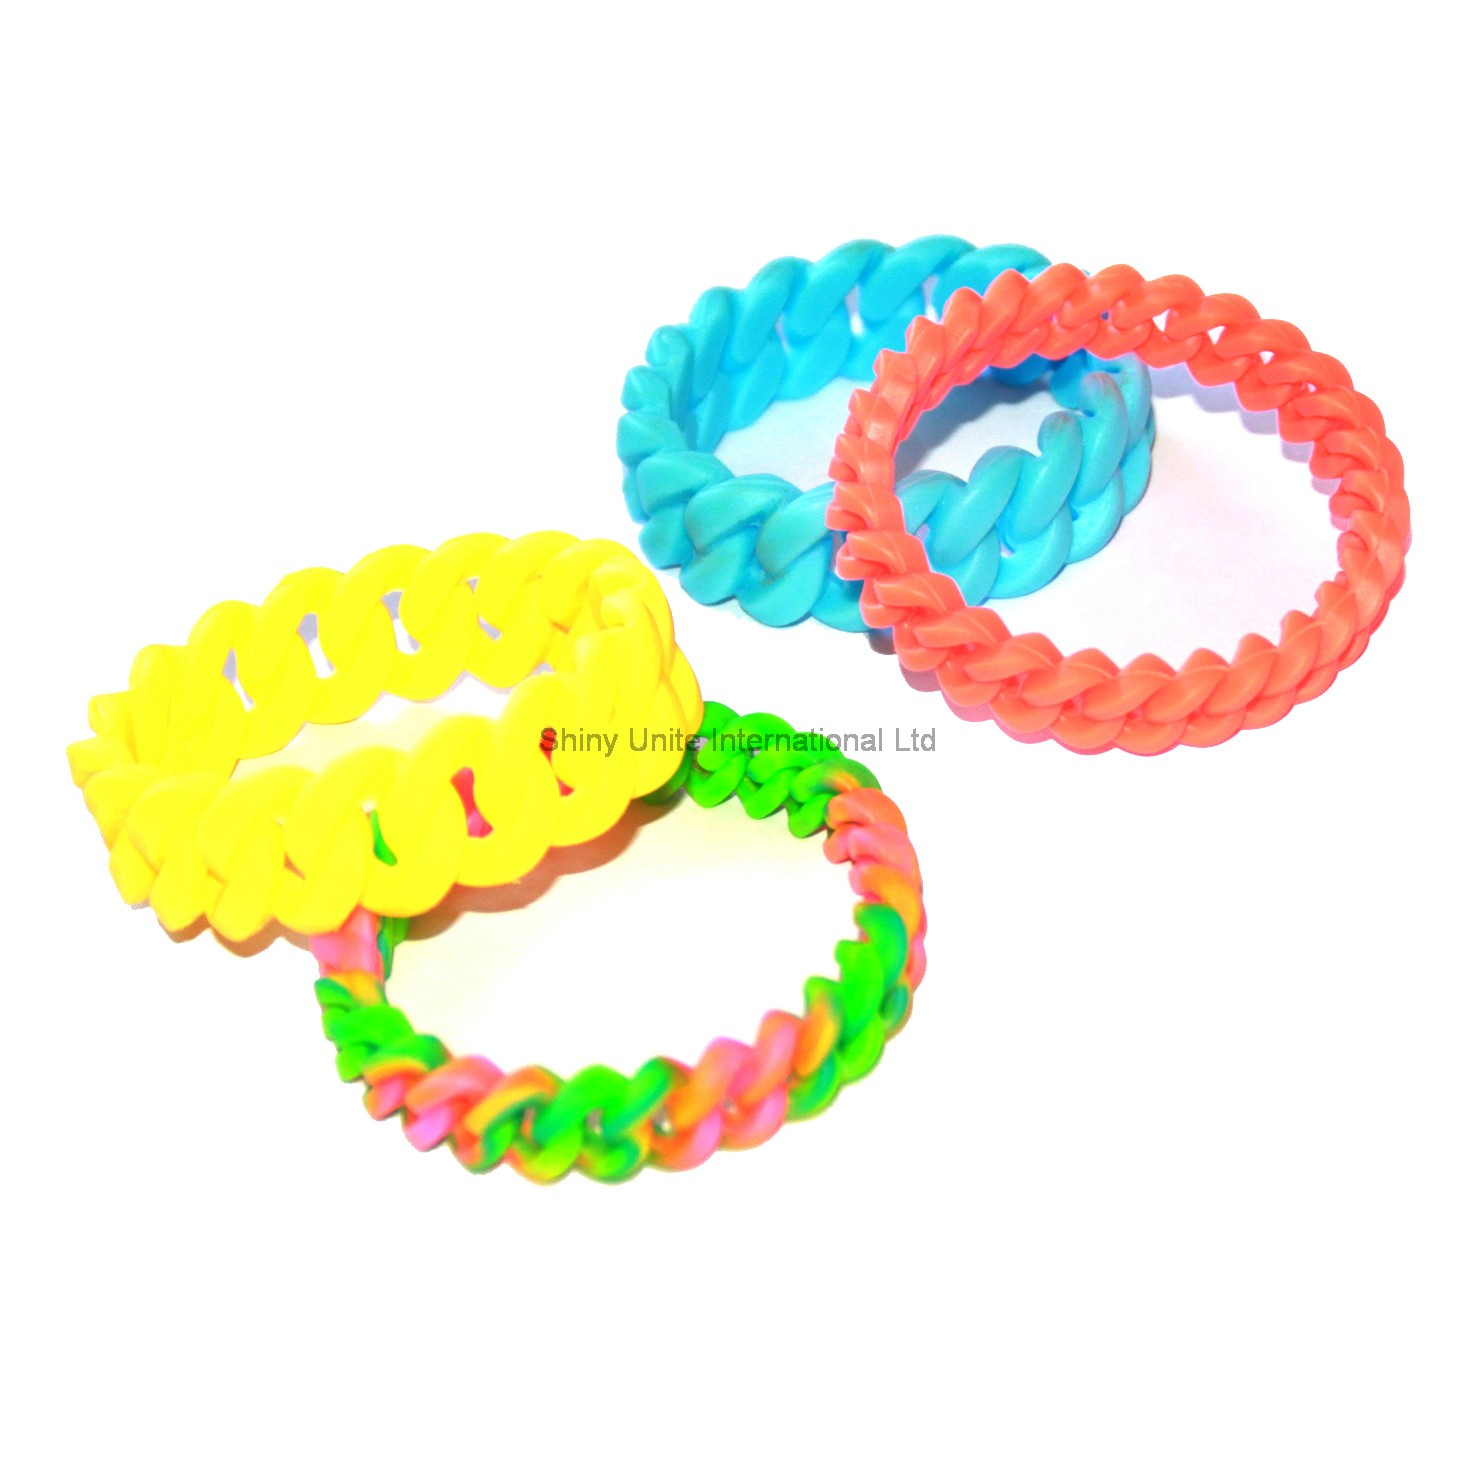 chain twist rubber band bracelet shiny unite